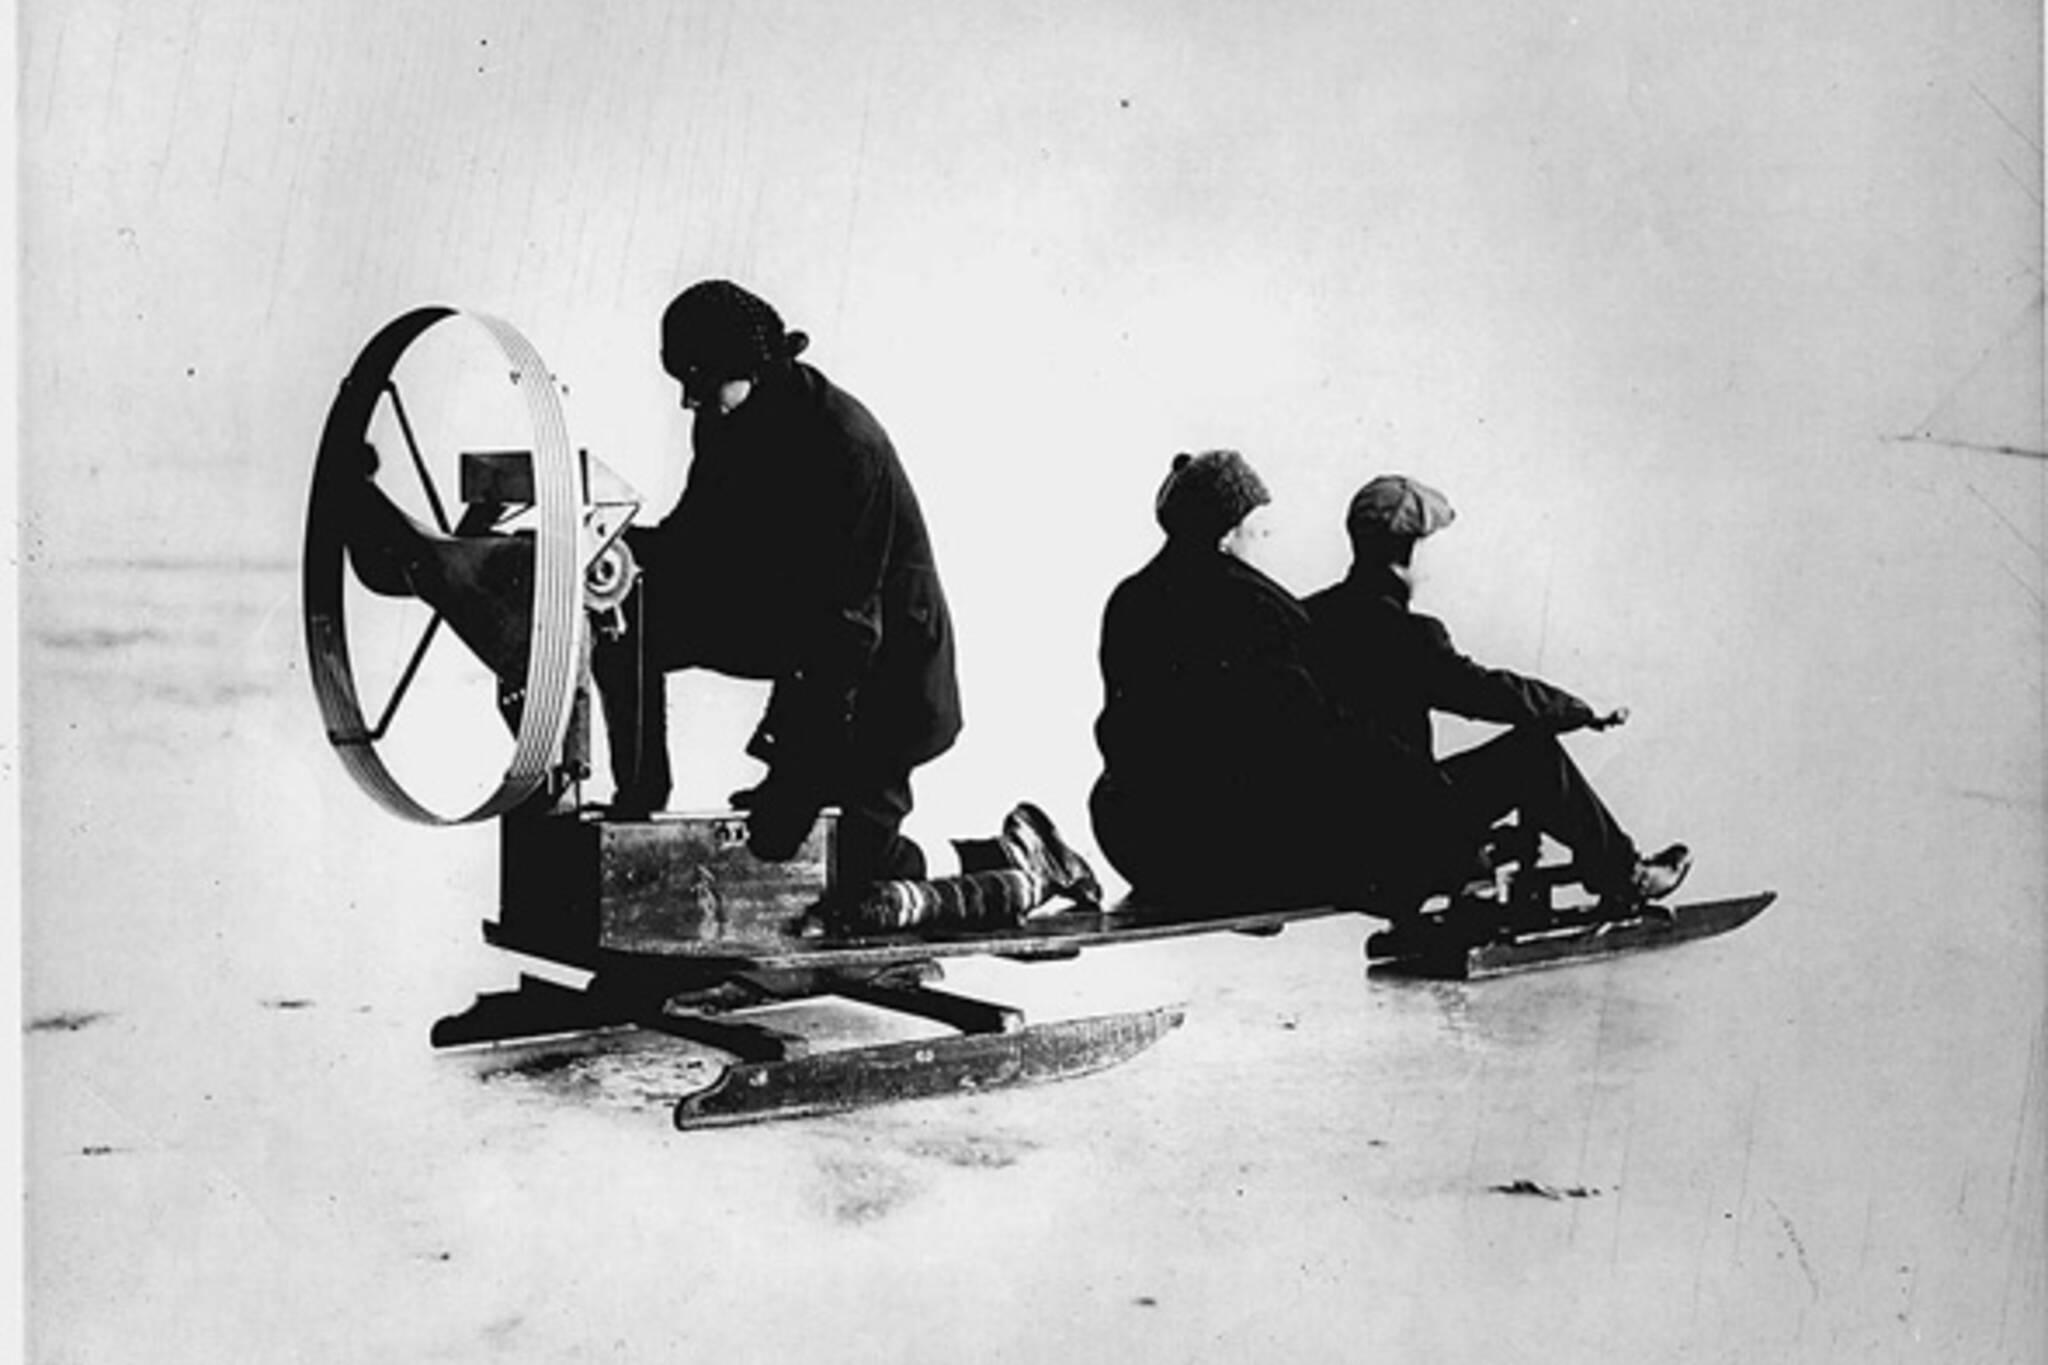 Winter Sports Toronto Vintage